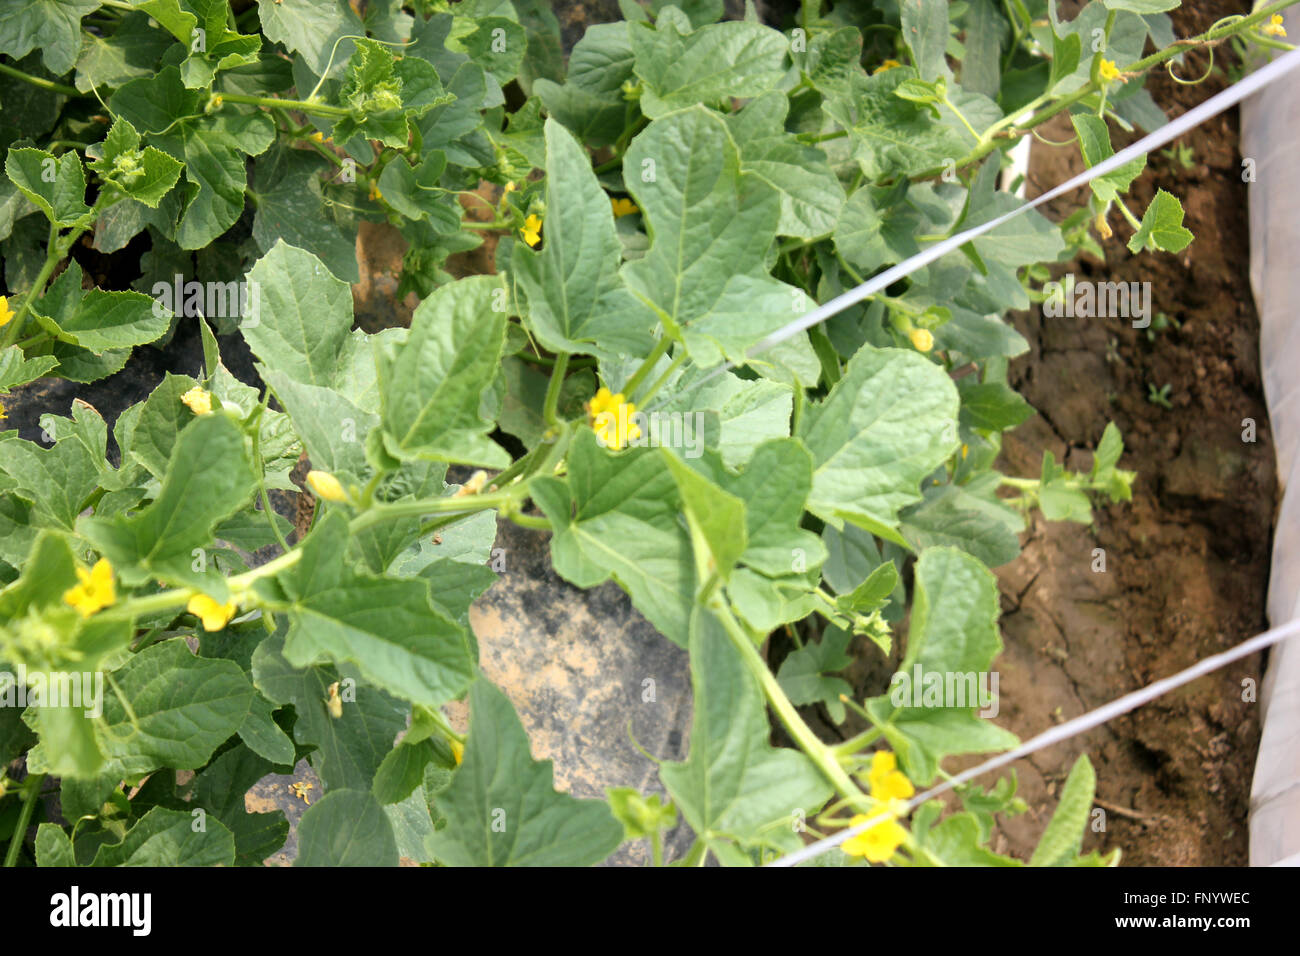 Cucumis melo sarda melon golden yellow melon on vine with tendrils cucumis melo sarda melon golden yellow melon on vine with tendrils small yellow flowers used as table fruit mightylinksfo Choice Image